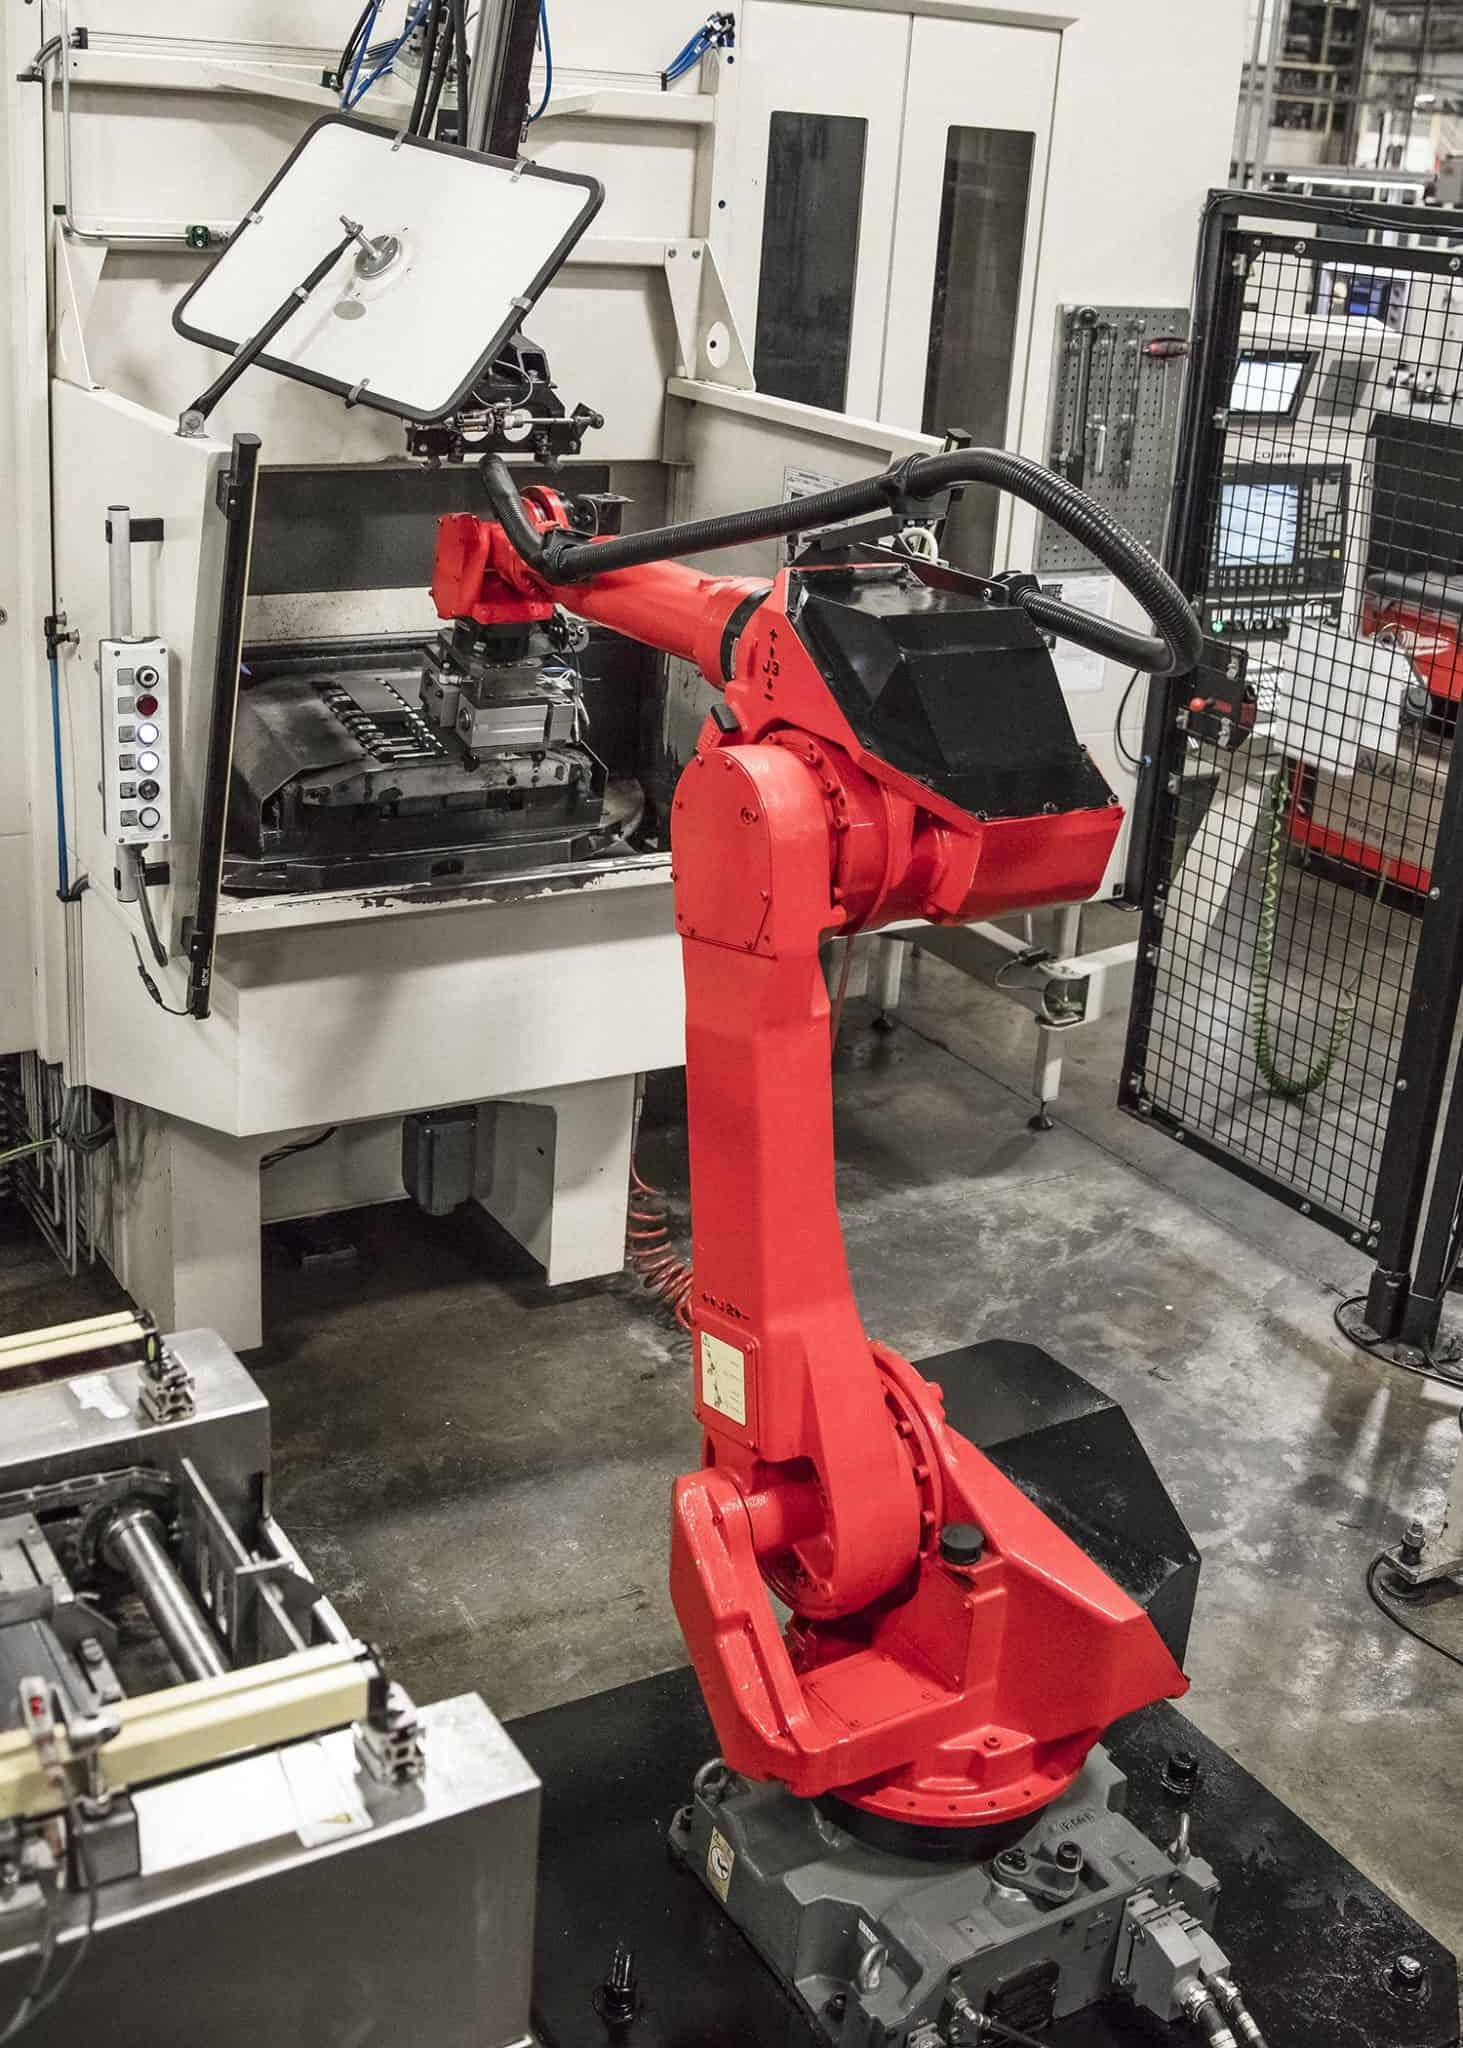 milwaukee tool factory tour